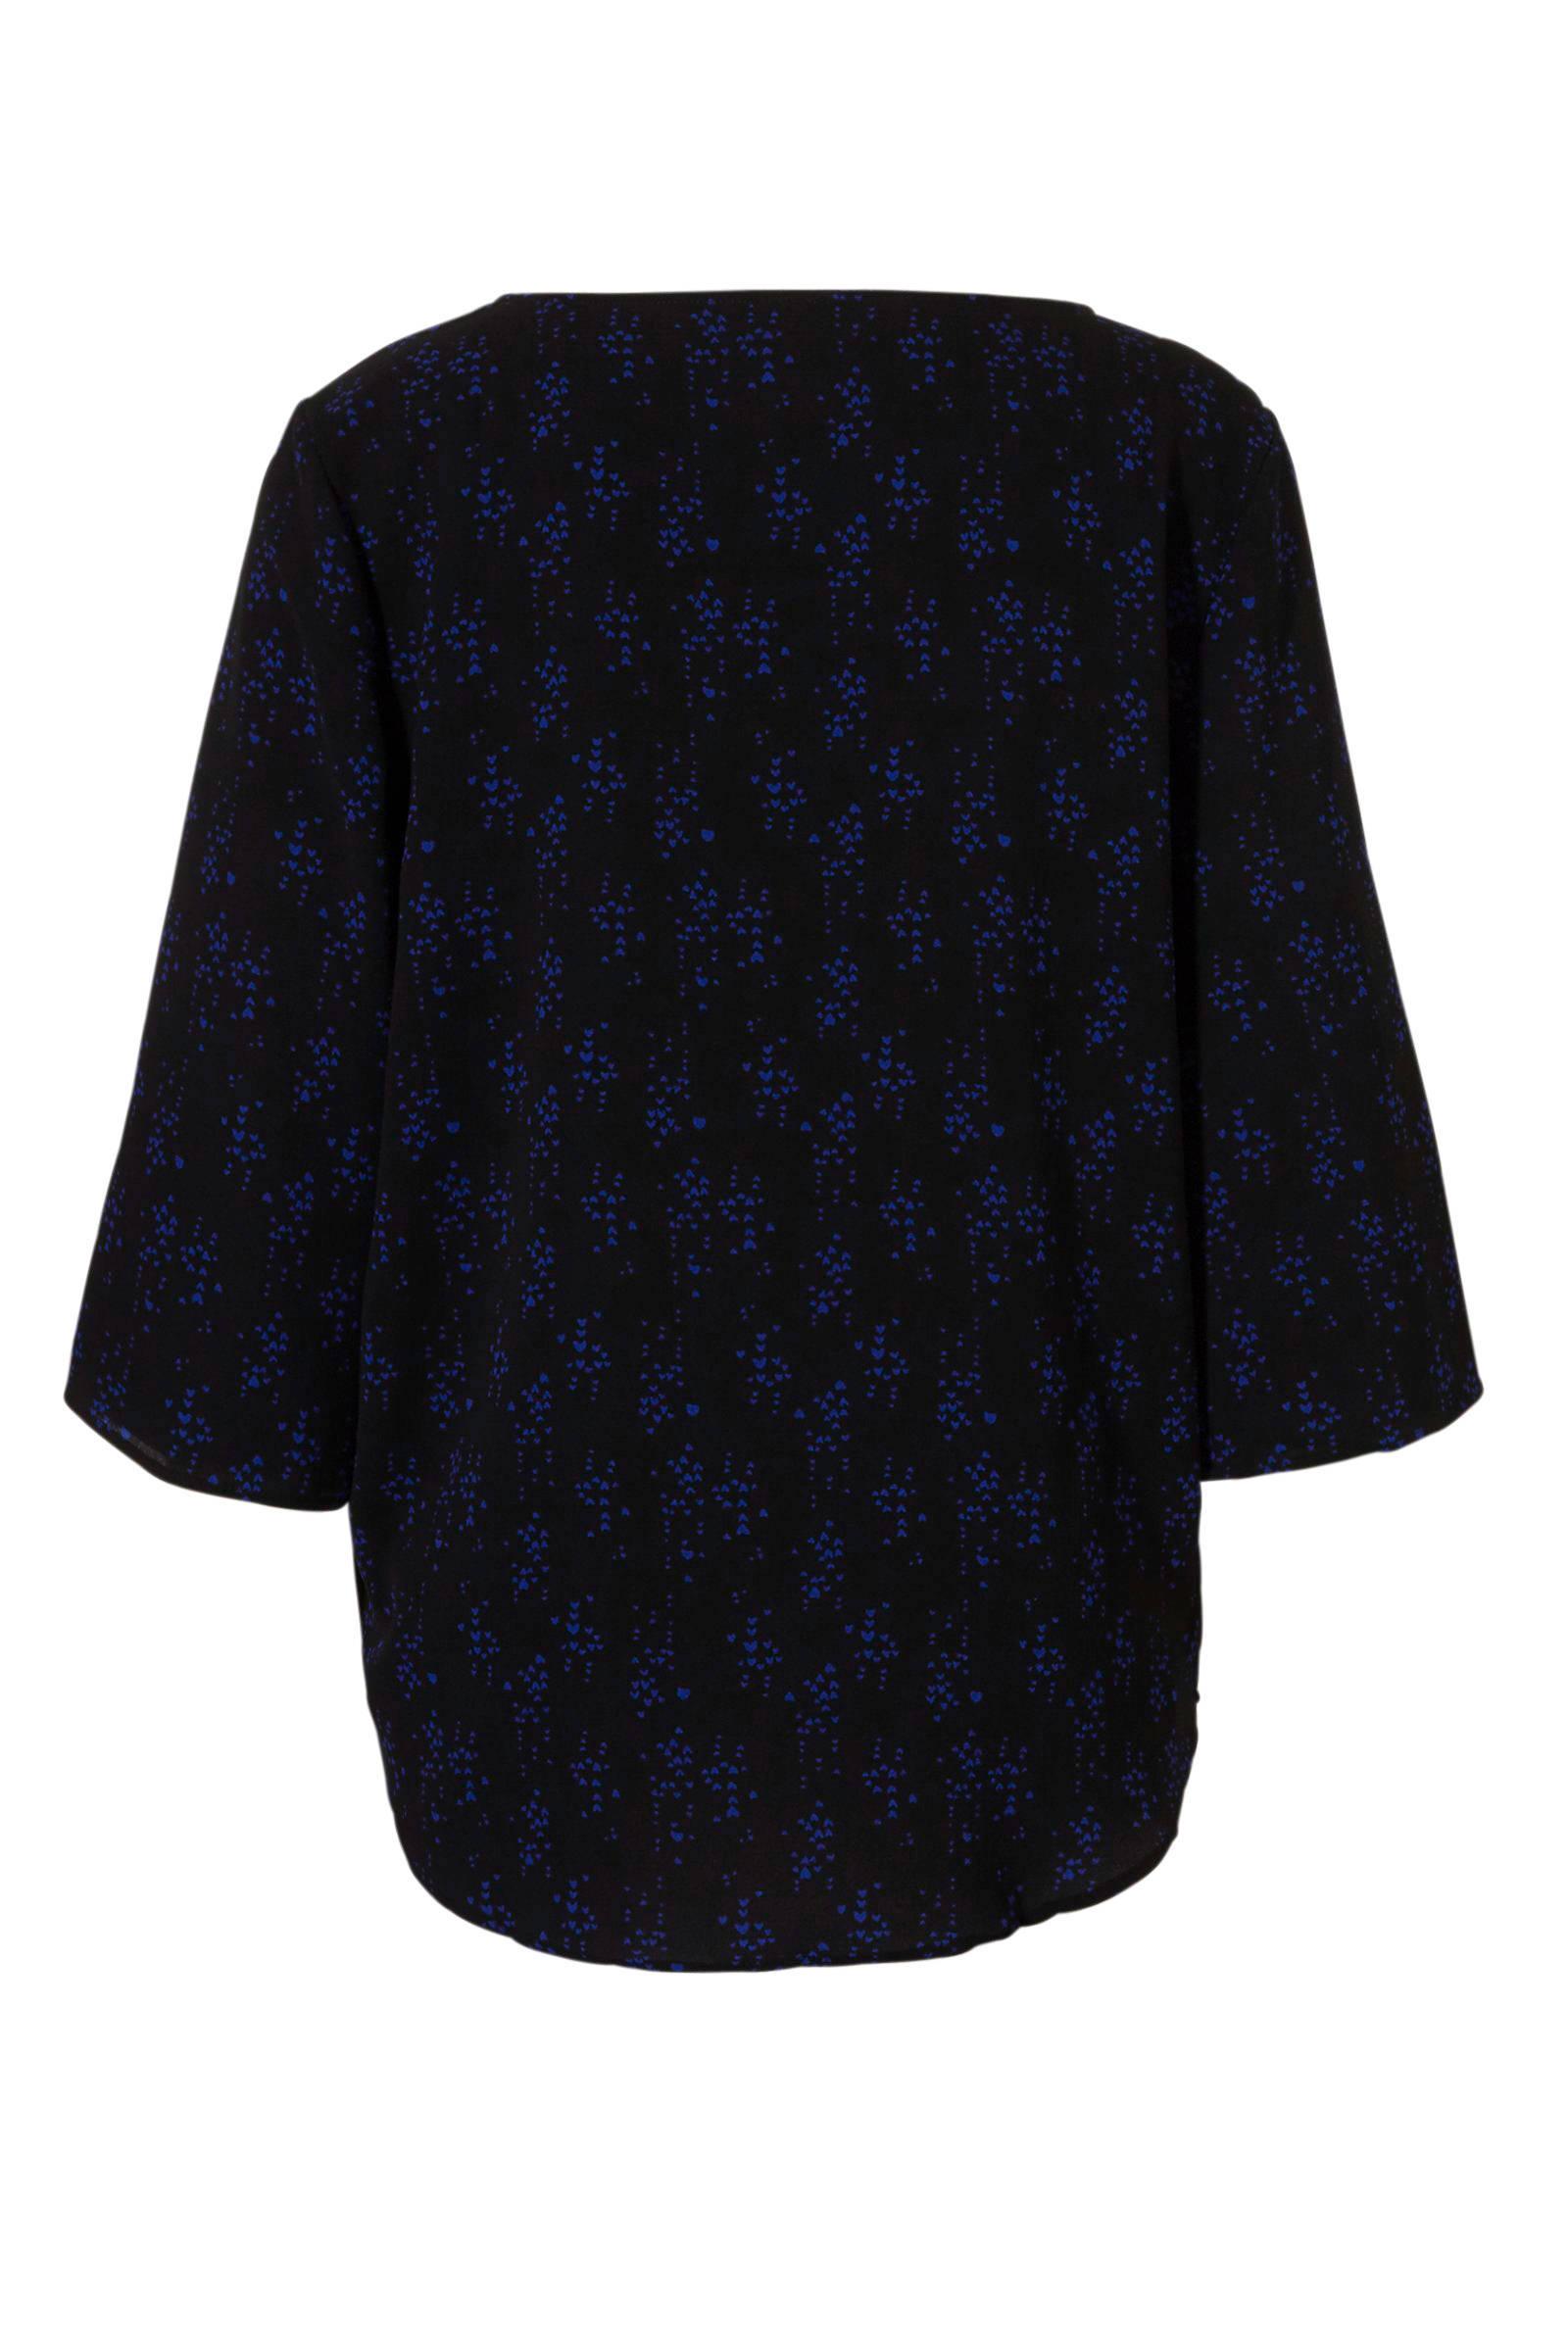 print YONG met over all JACQUELINE zwart blouse DE 8fUqY